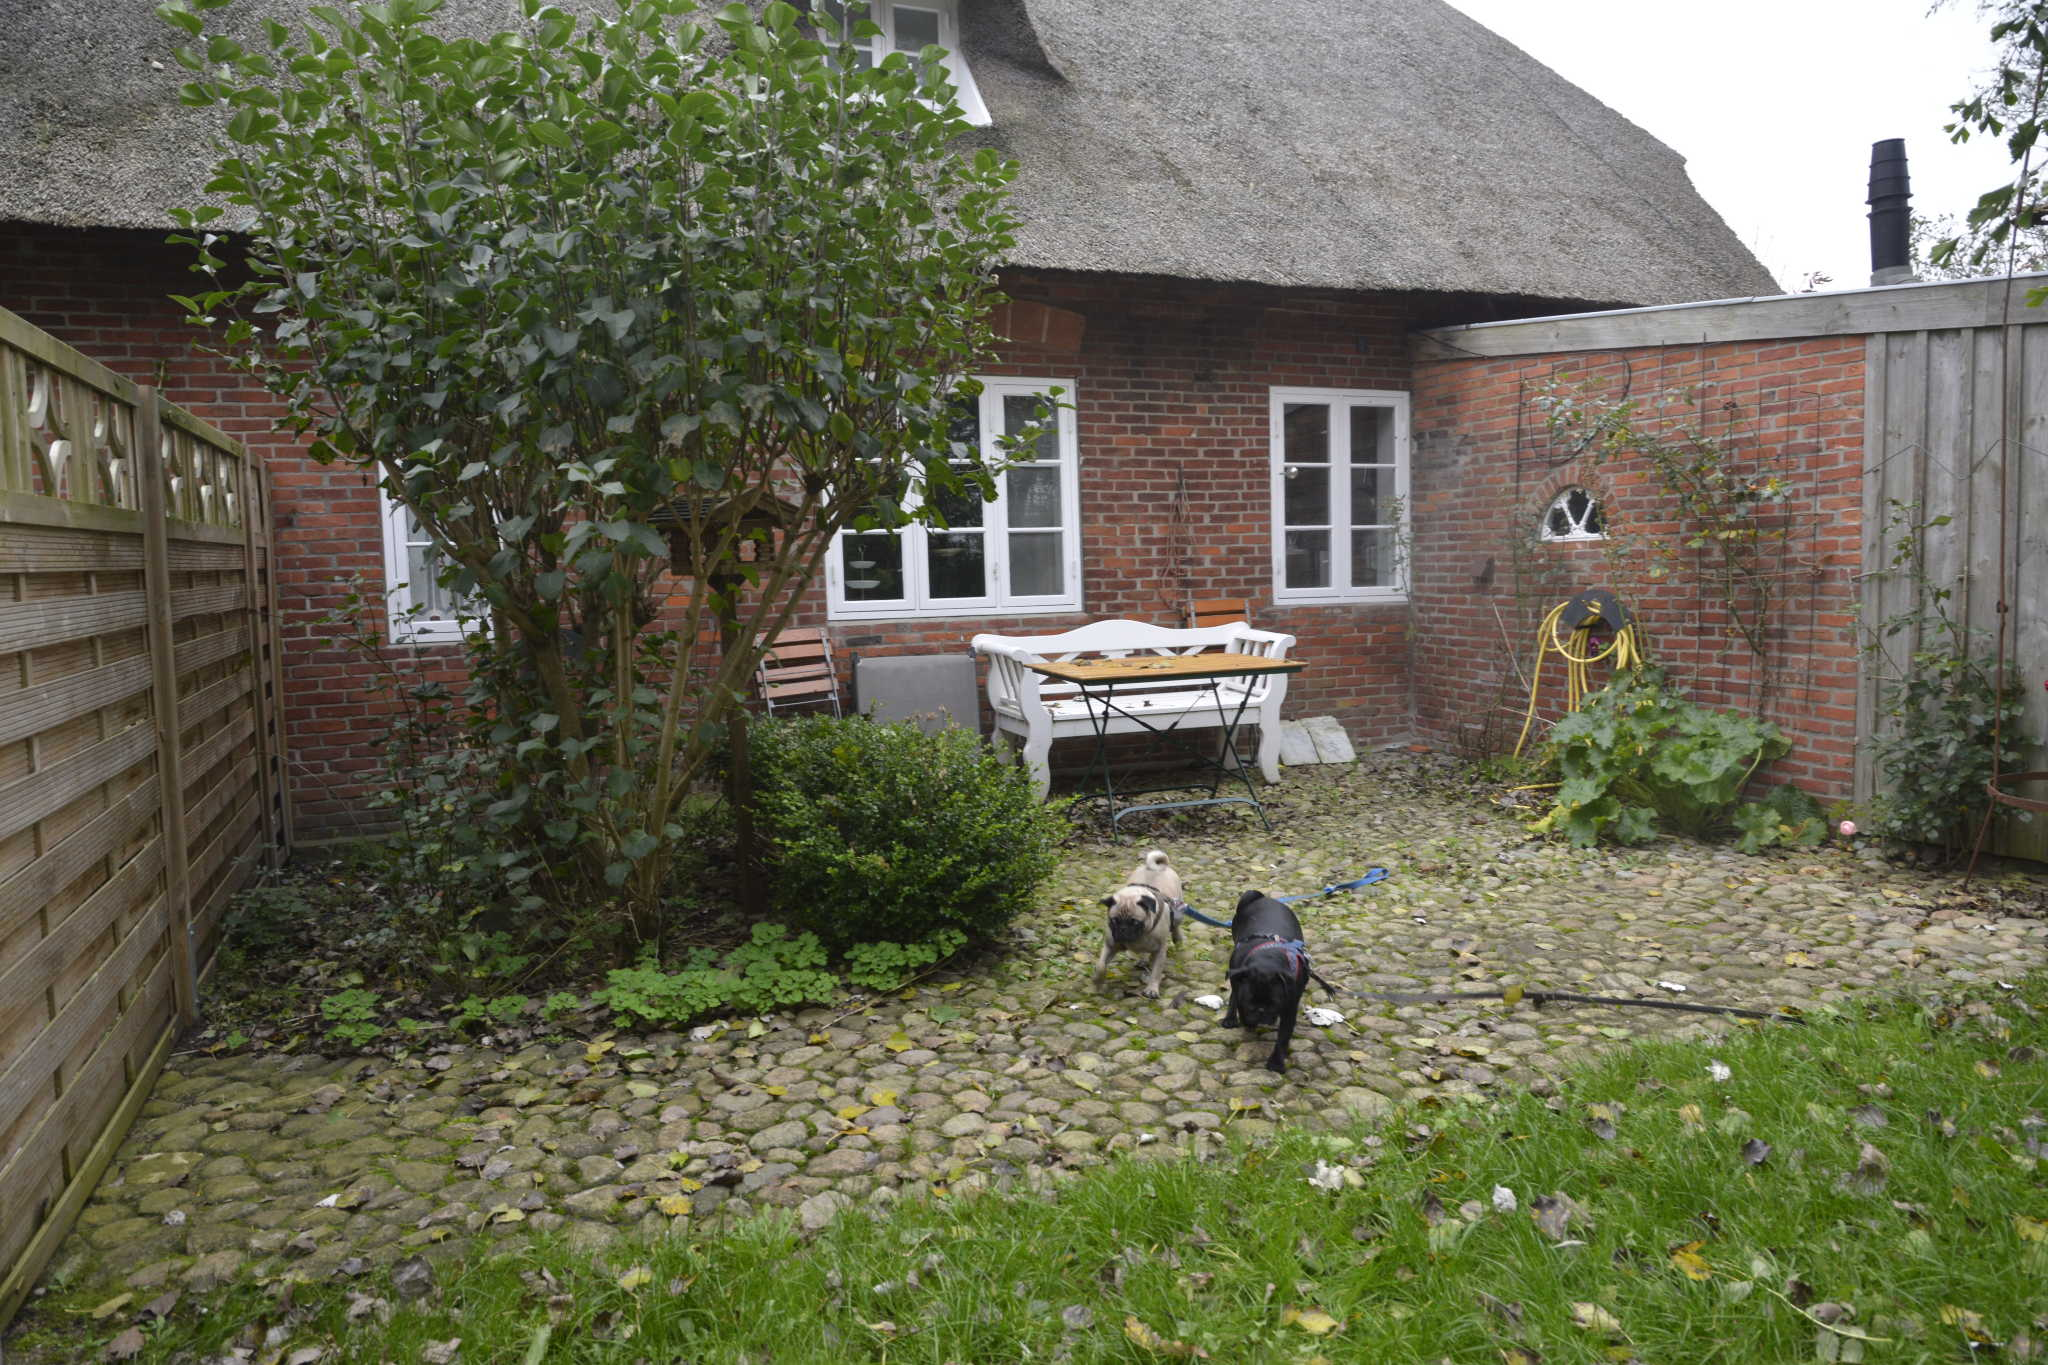 friesenhaus 39 schohmaker huus 39 haus hans in aventoft schleswig holstein petra sattelberg. Black Bedroom Furniture Sets. Home Design Ideas